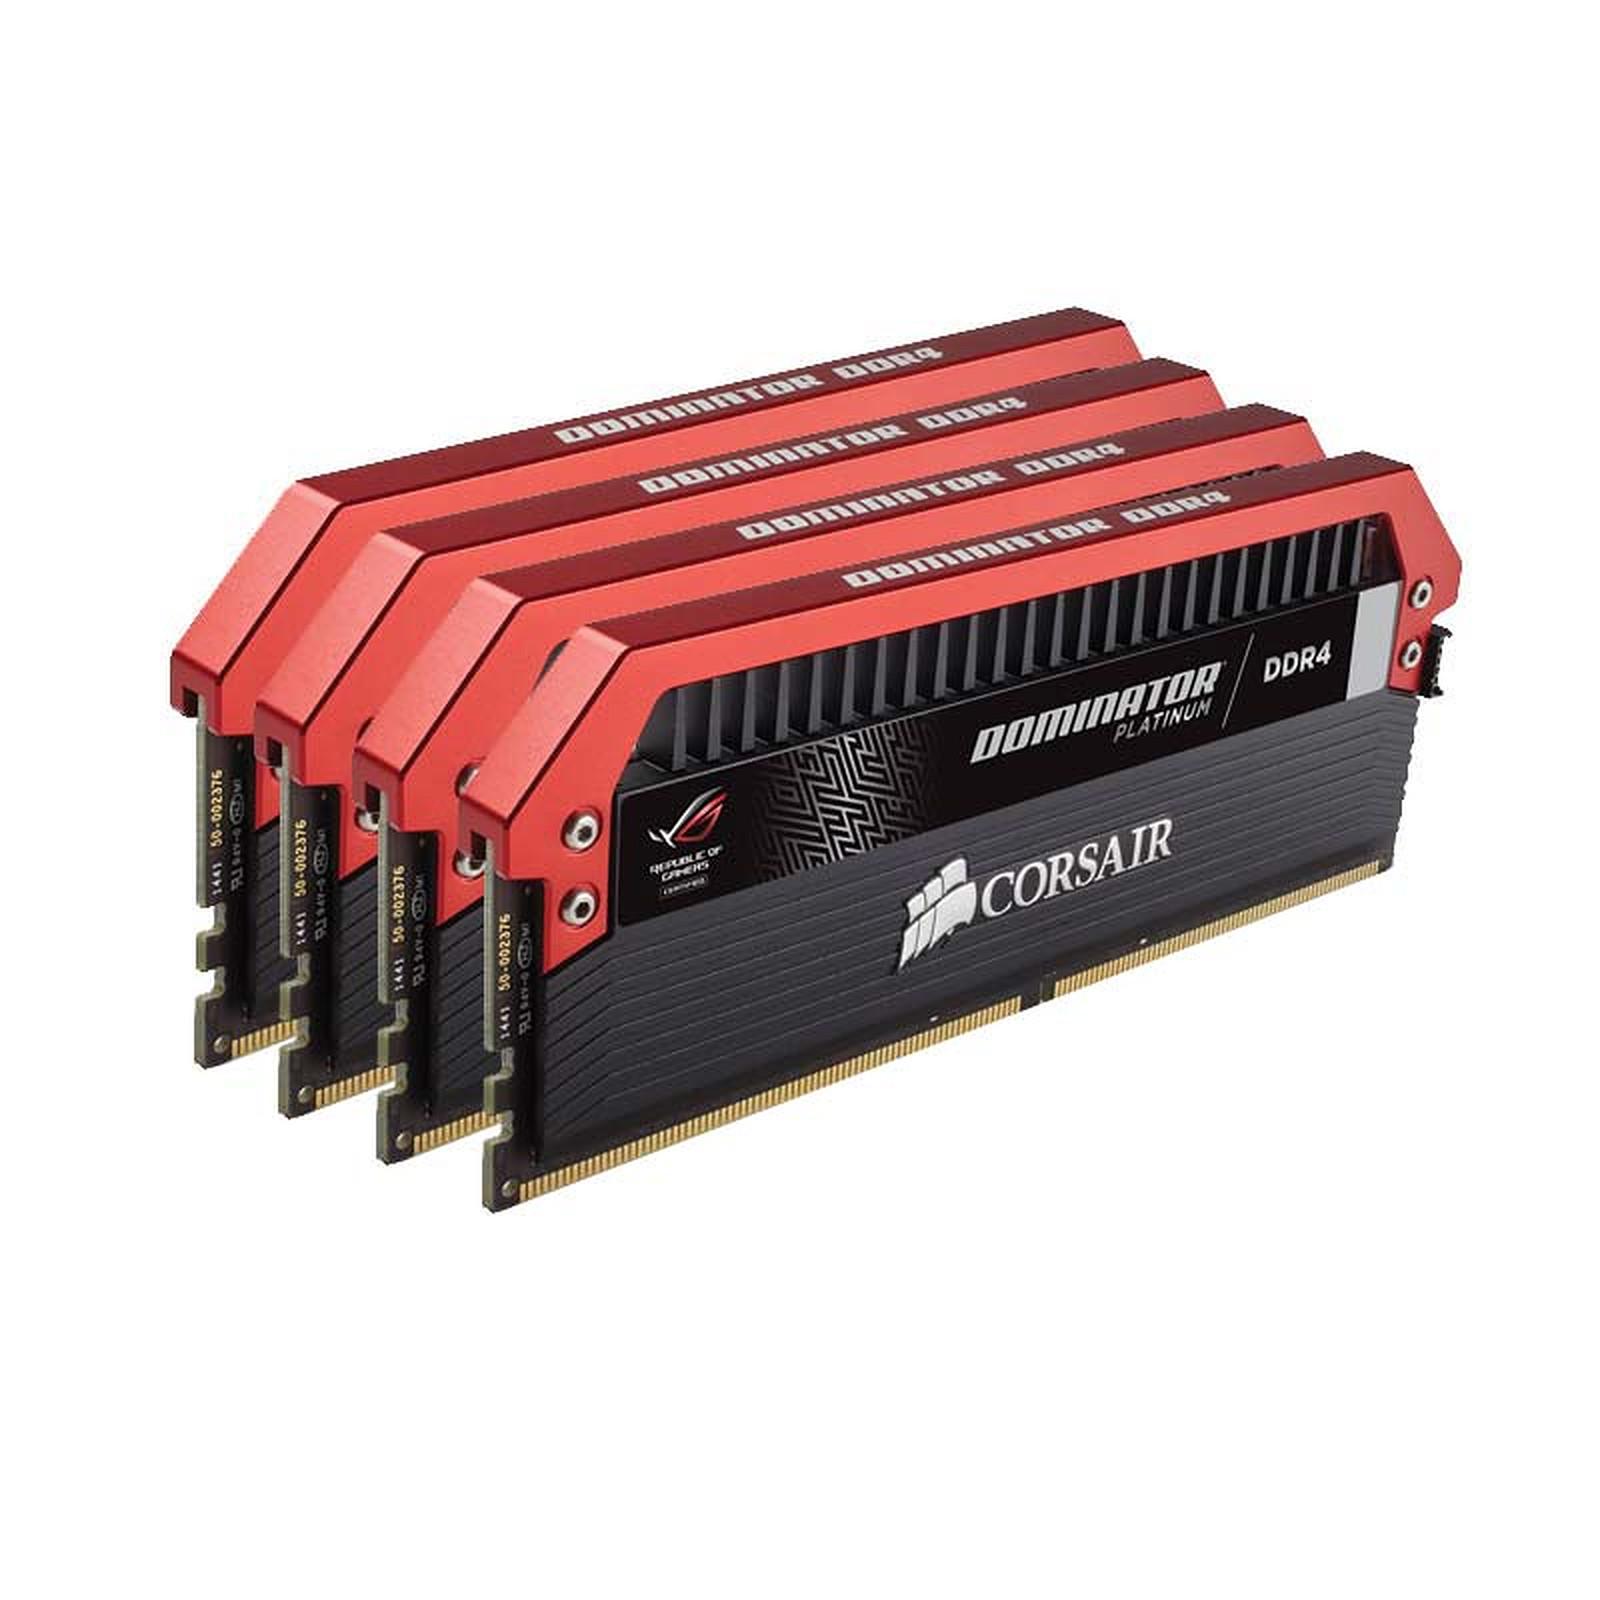 Corsair Dominator Platinum ROG 16 Go (4x 4 Go) DDR4 3200 MHz CL16